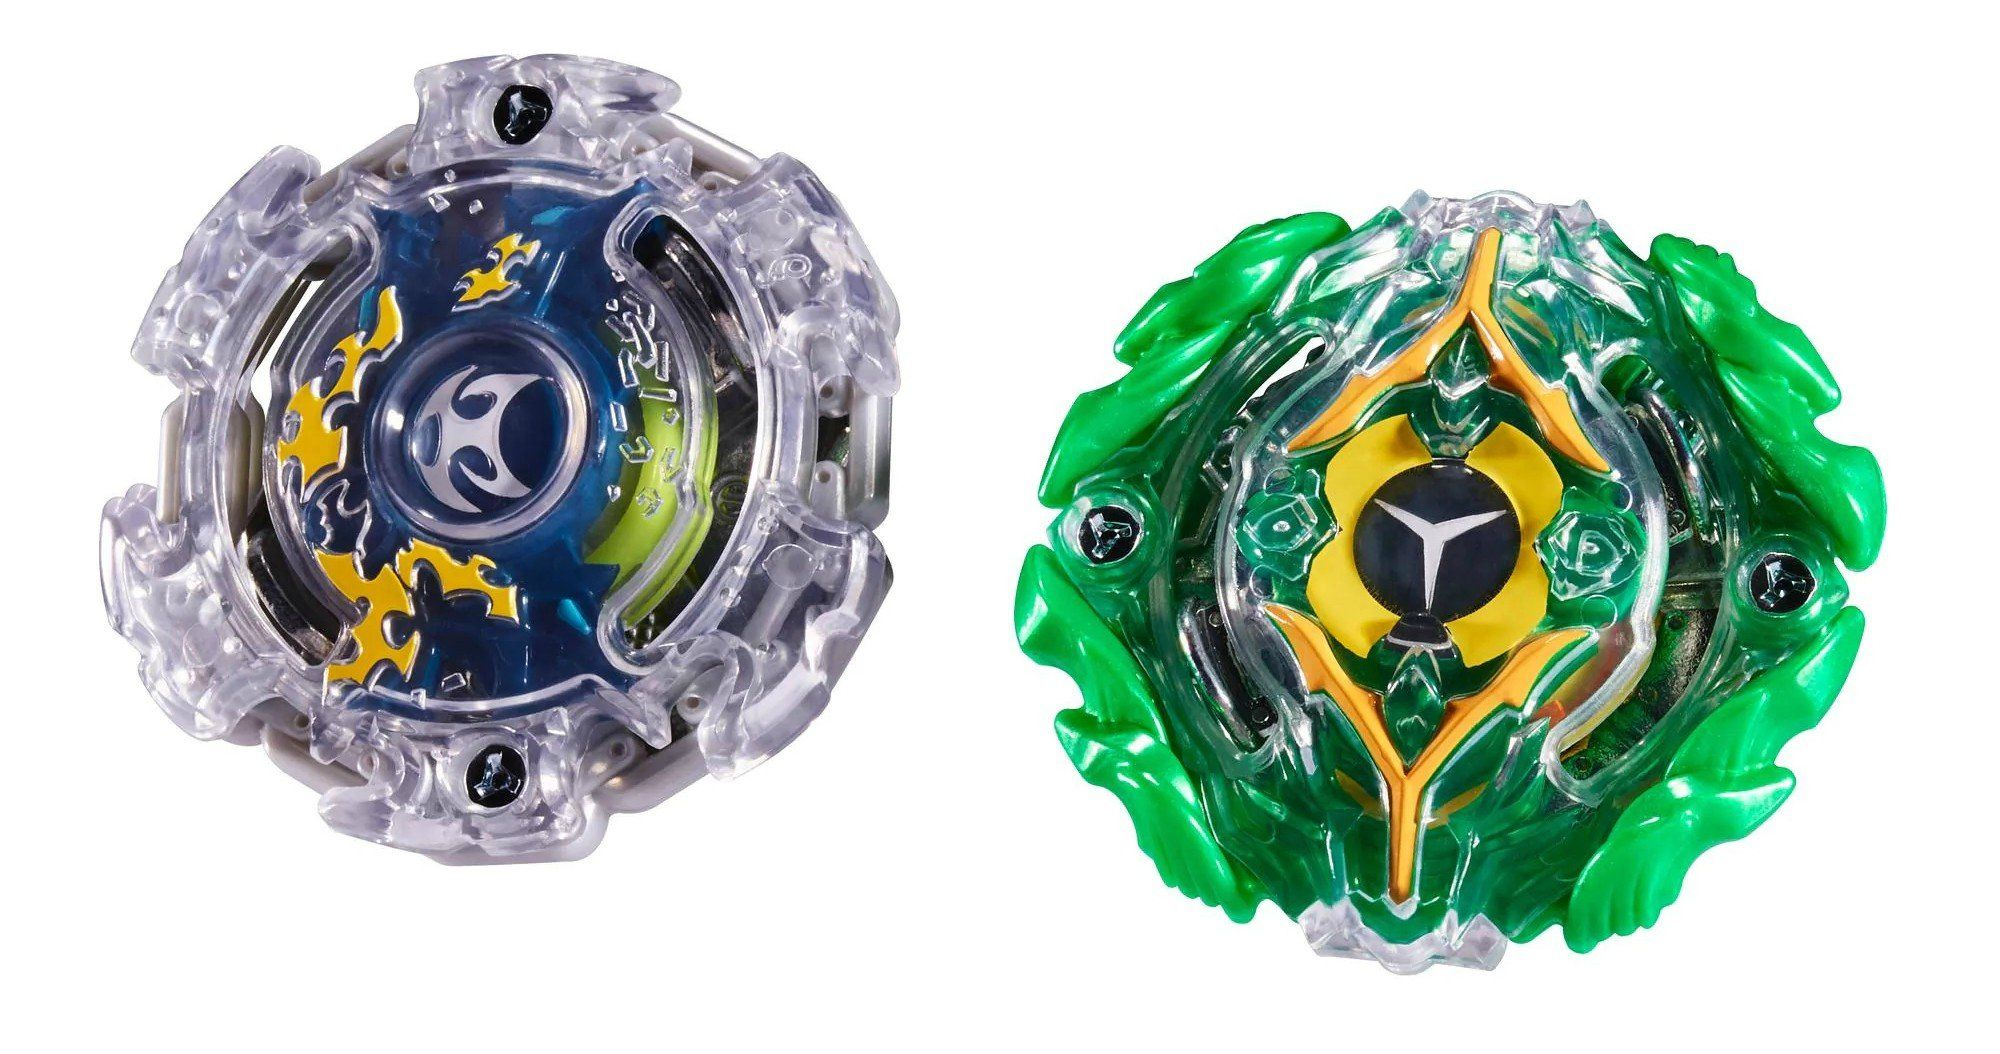 Kit Duplo Beyblade Burst: Kerbeus K2 & Yegdrion Y2 - Hasbro